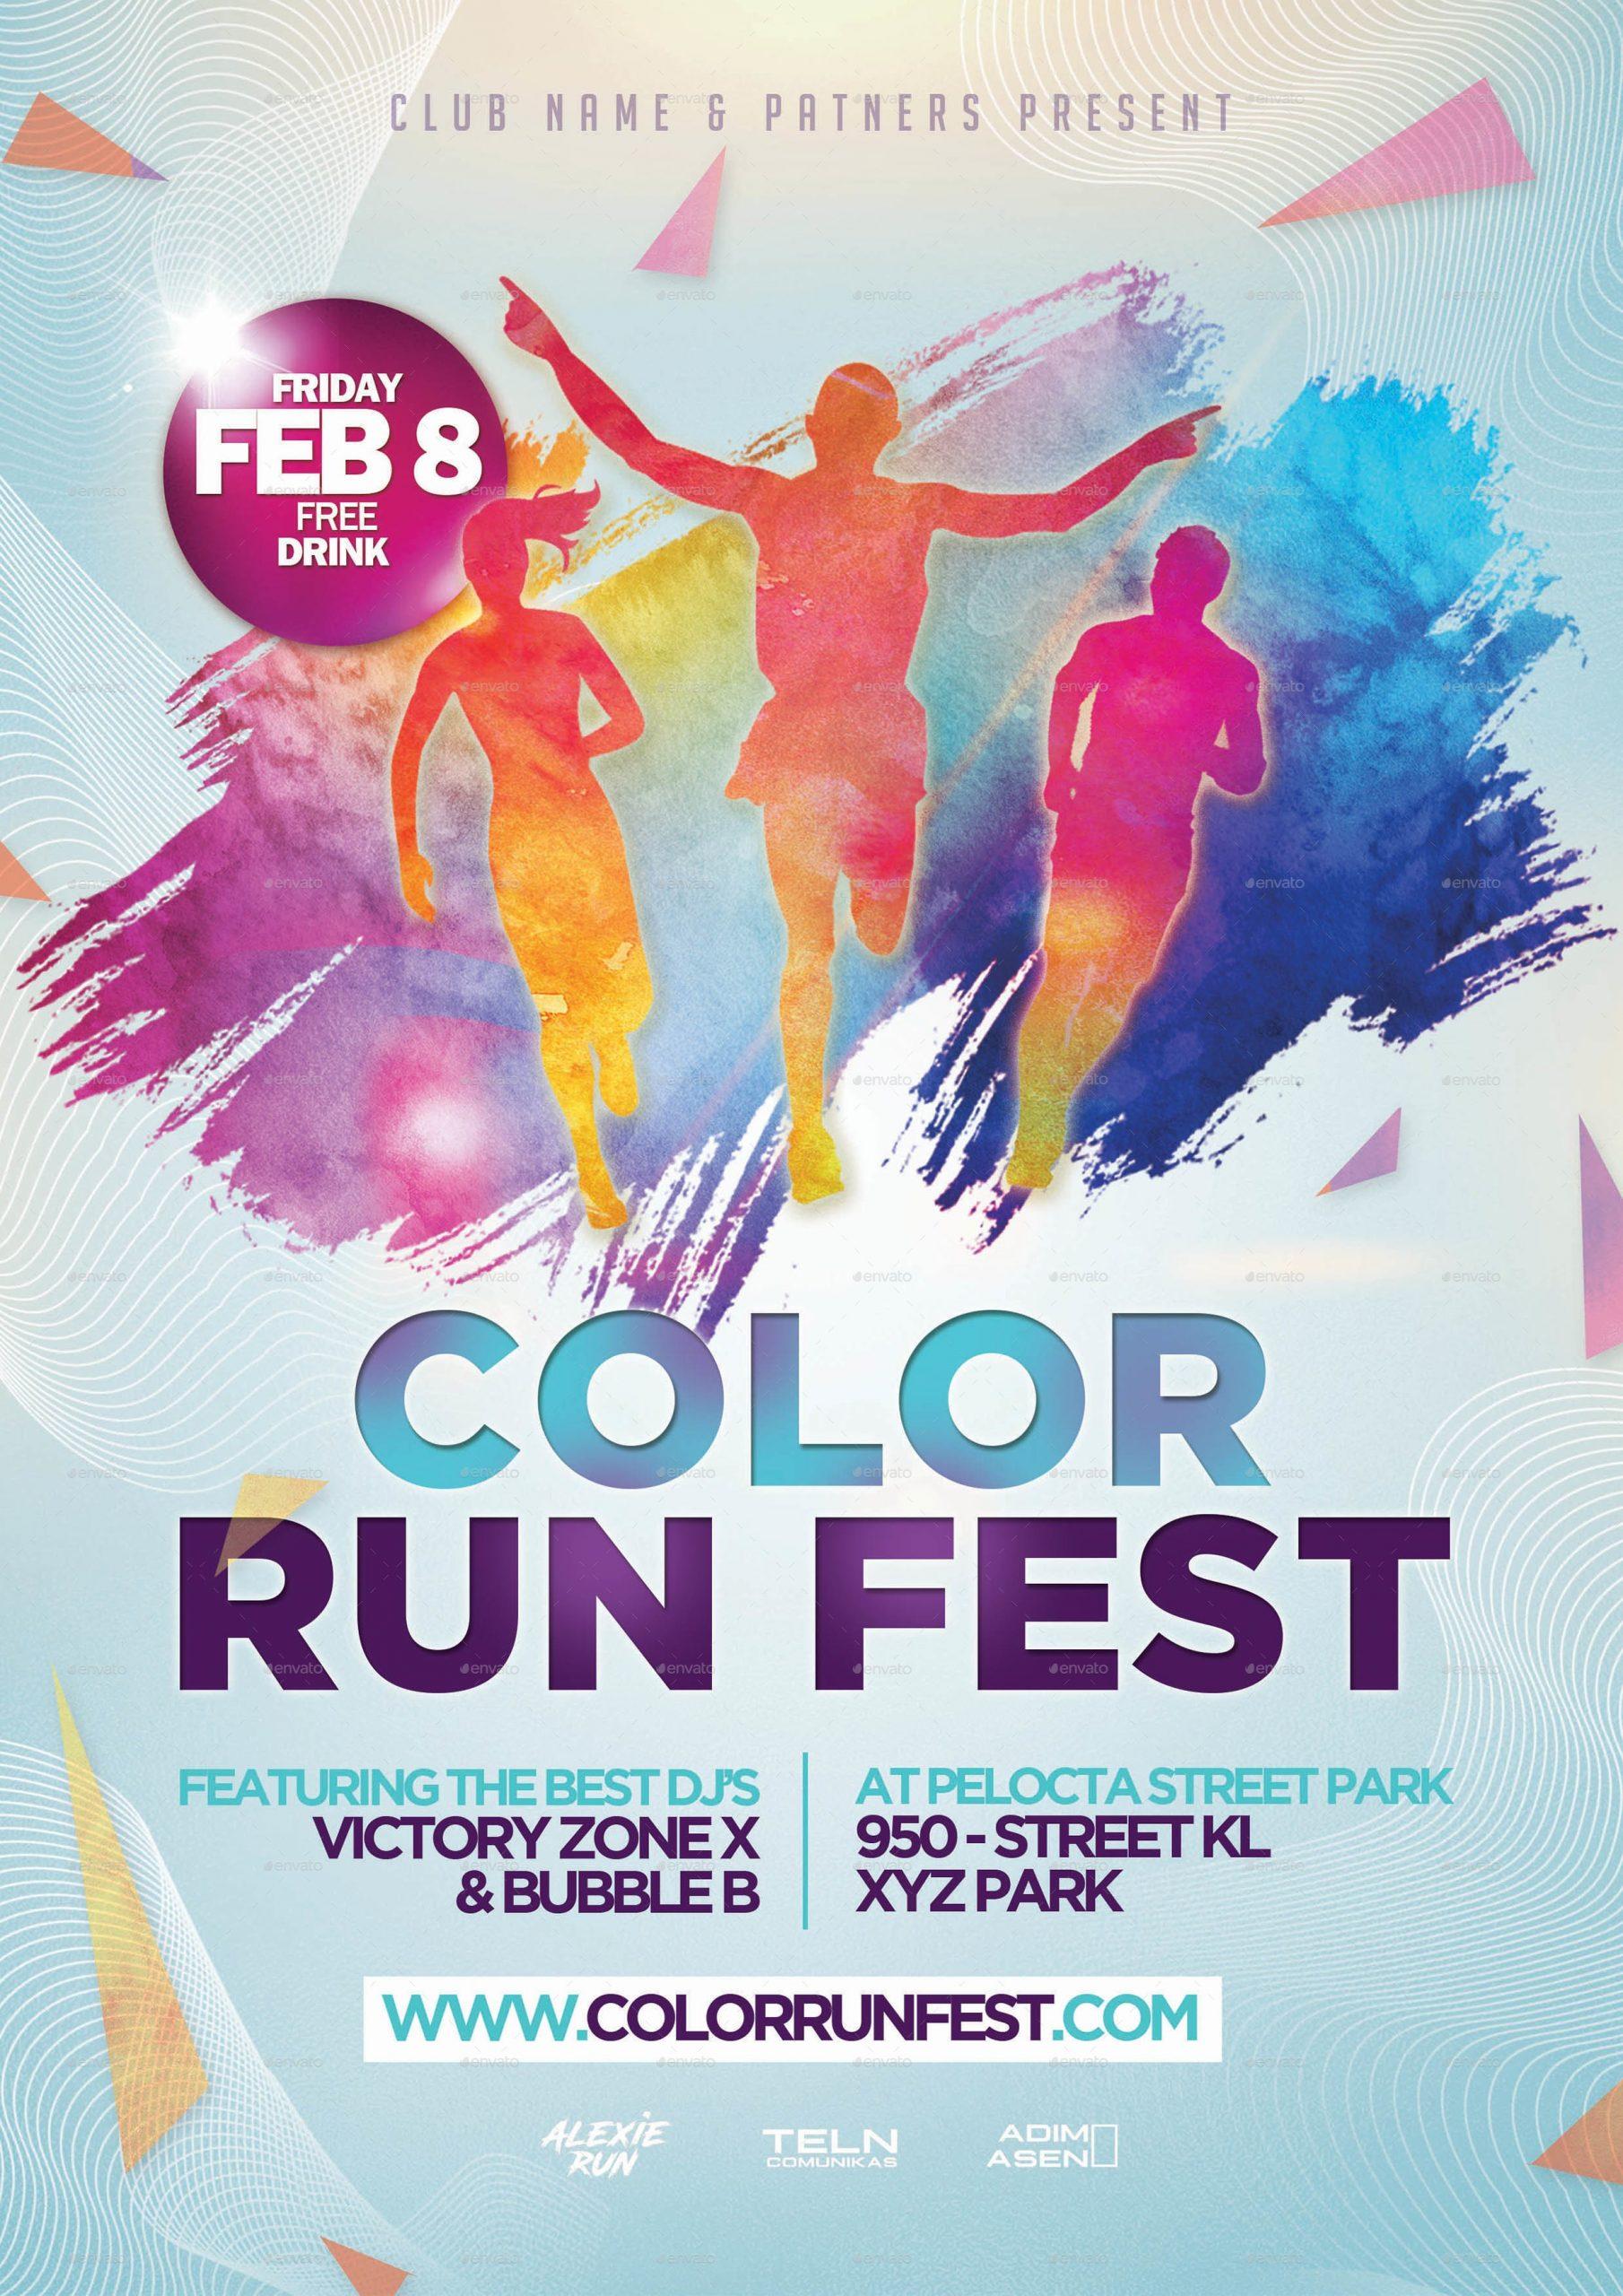 flyer template color run poster  Color Run Festival Flyer Template by adimasen | GraphicRiver - flyer template color run poster